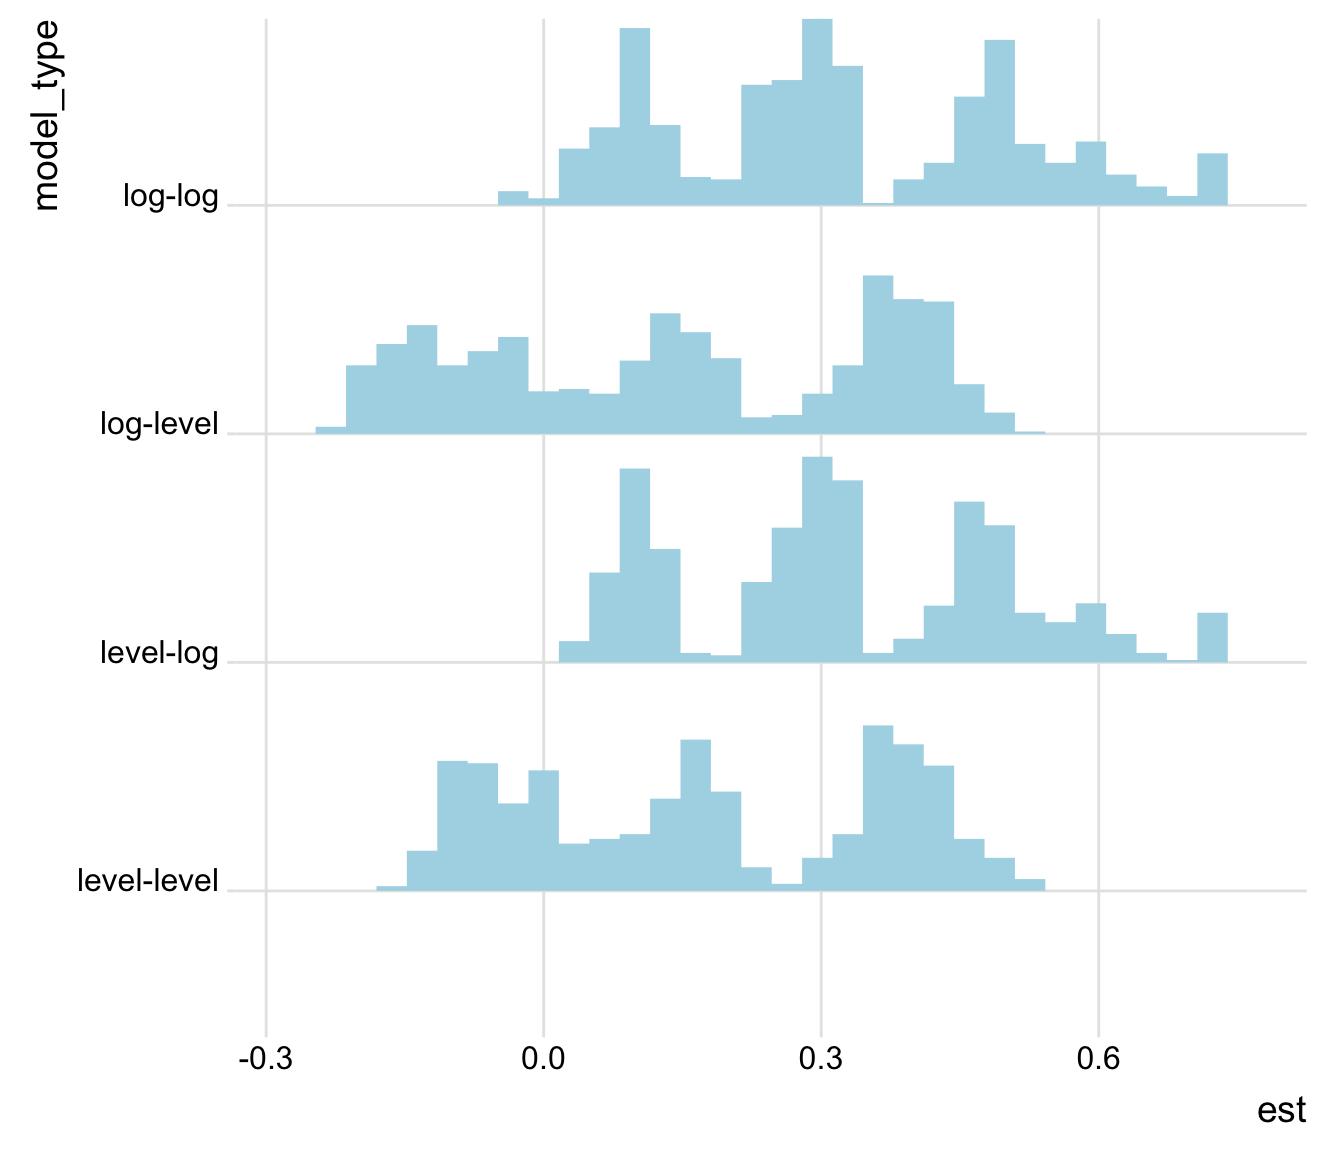 Estimates by model specification